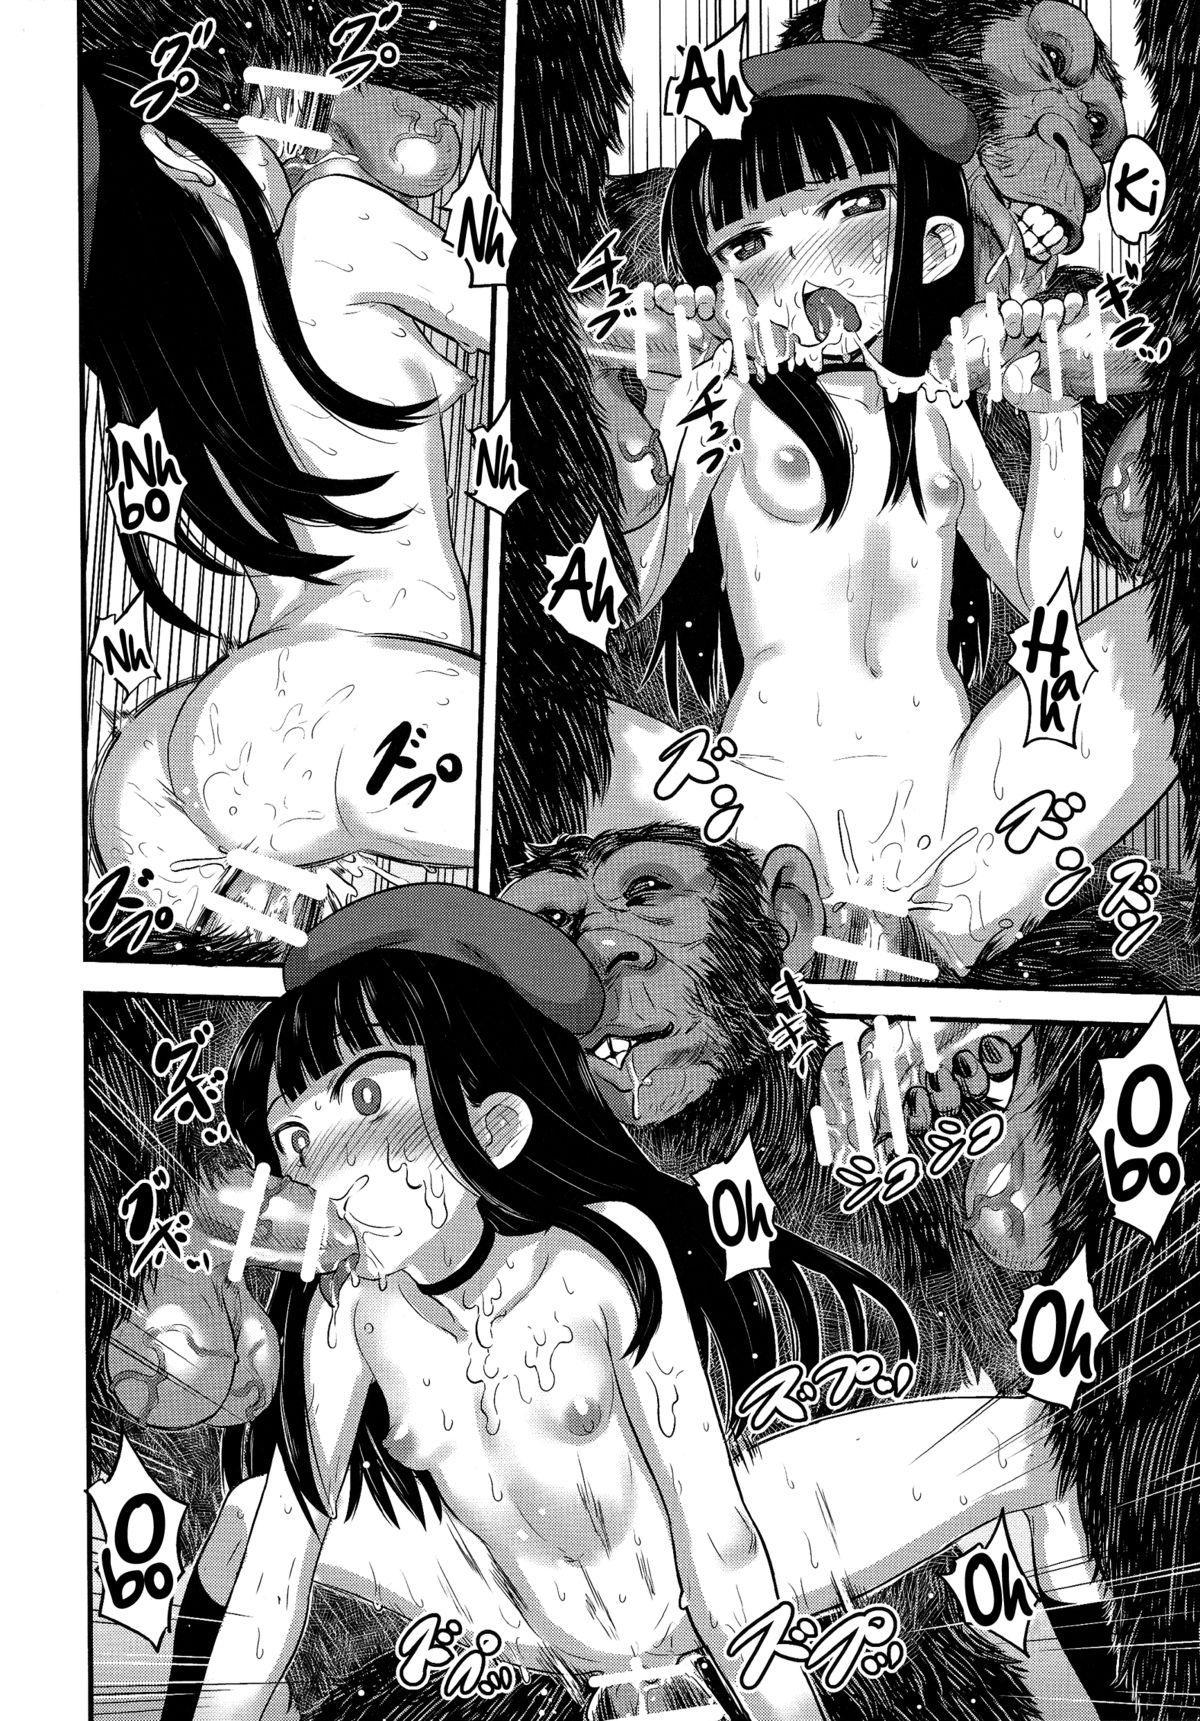 Hadakahime Honoka 2 Misemono Tanetsuke Saru Koubi | Naked Princess Honoka 2 - Mating Exhibition: Monkey Coitus 18